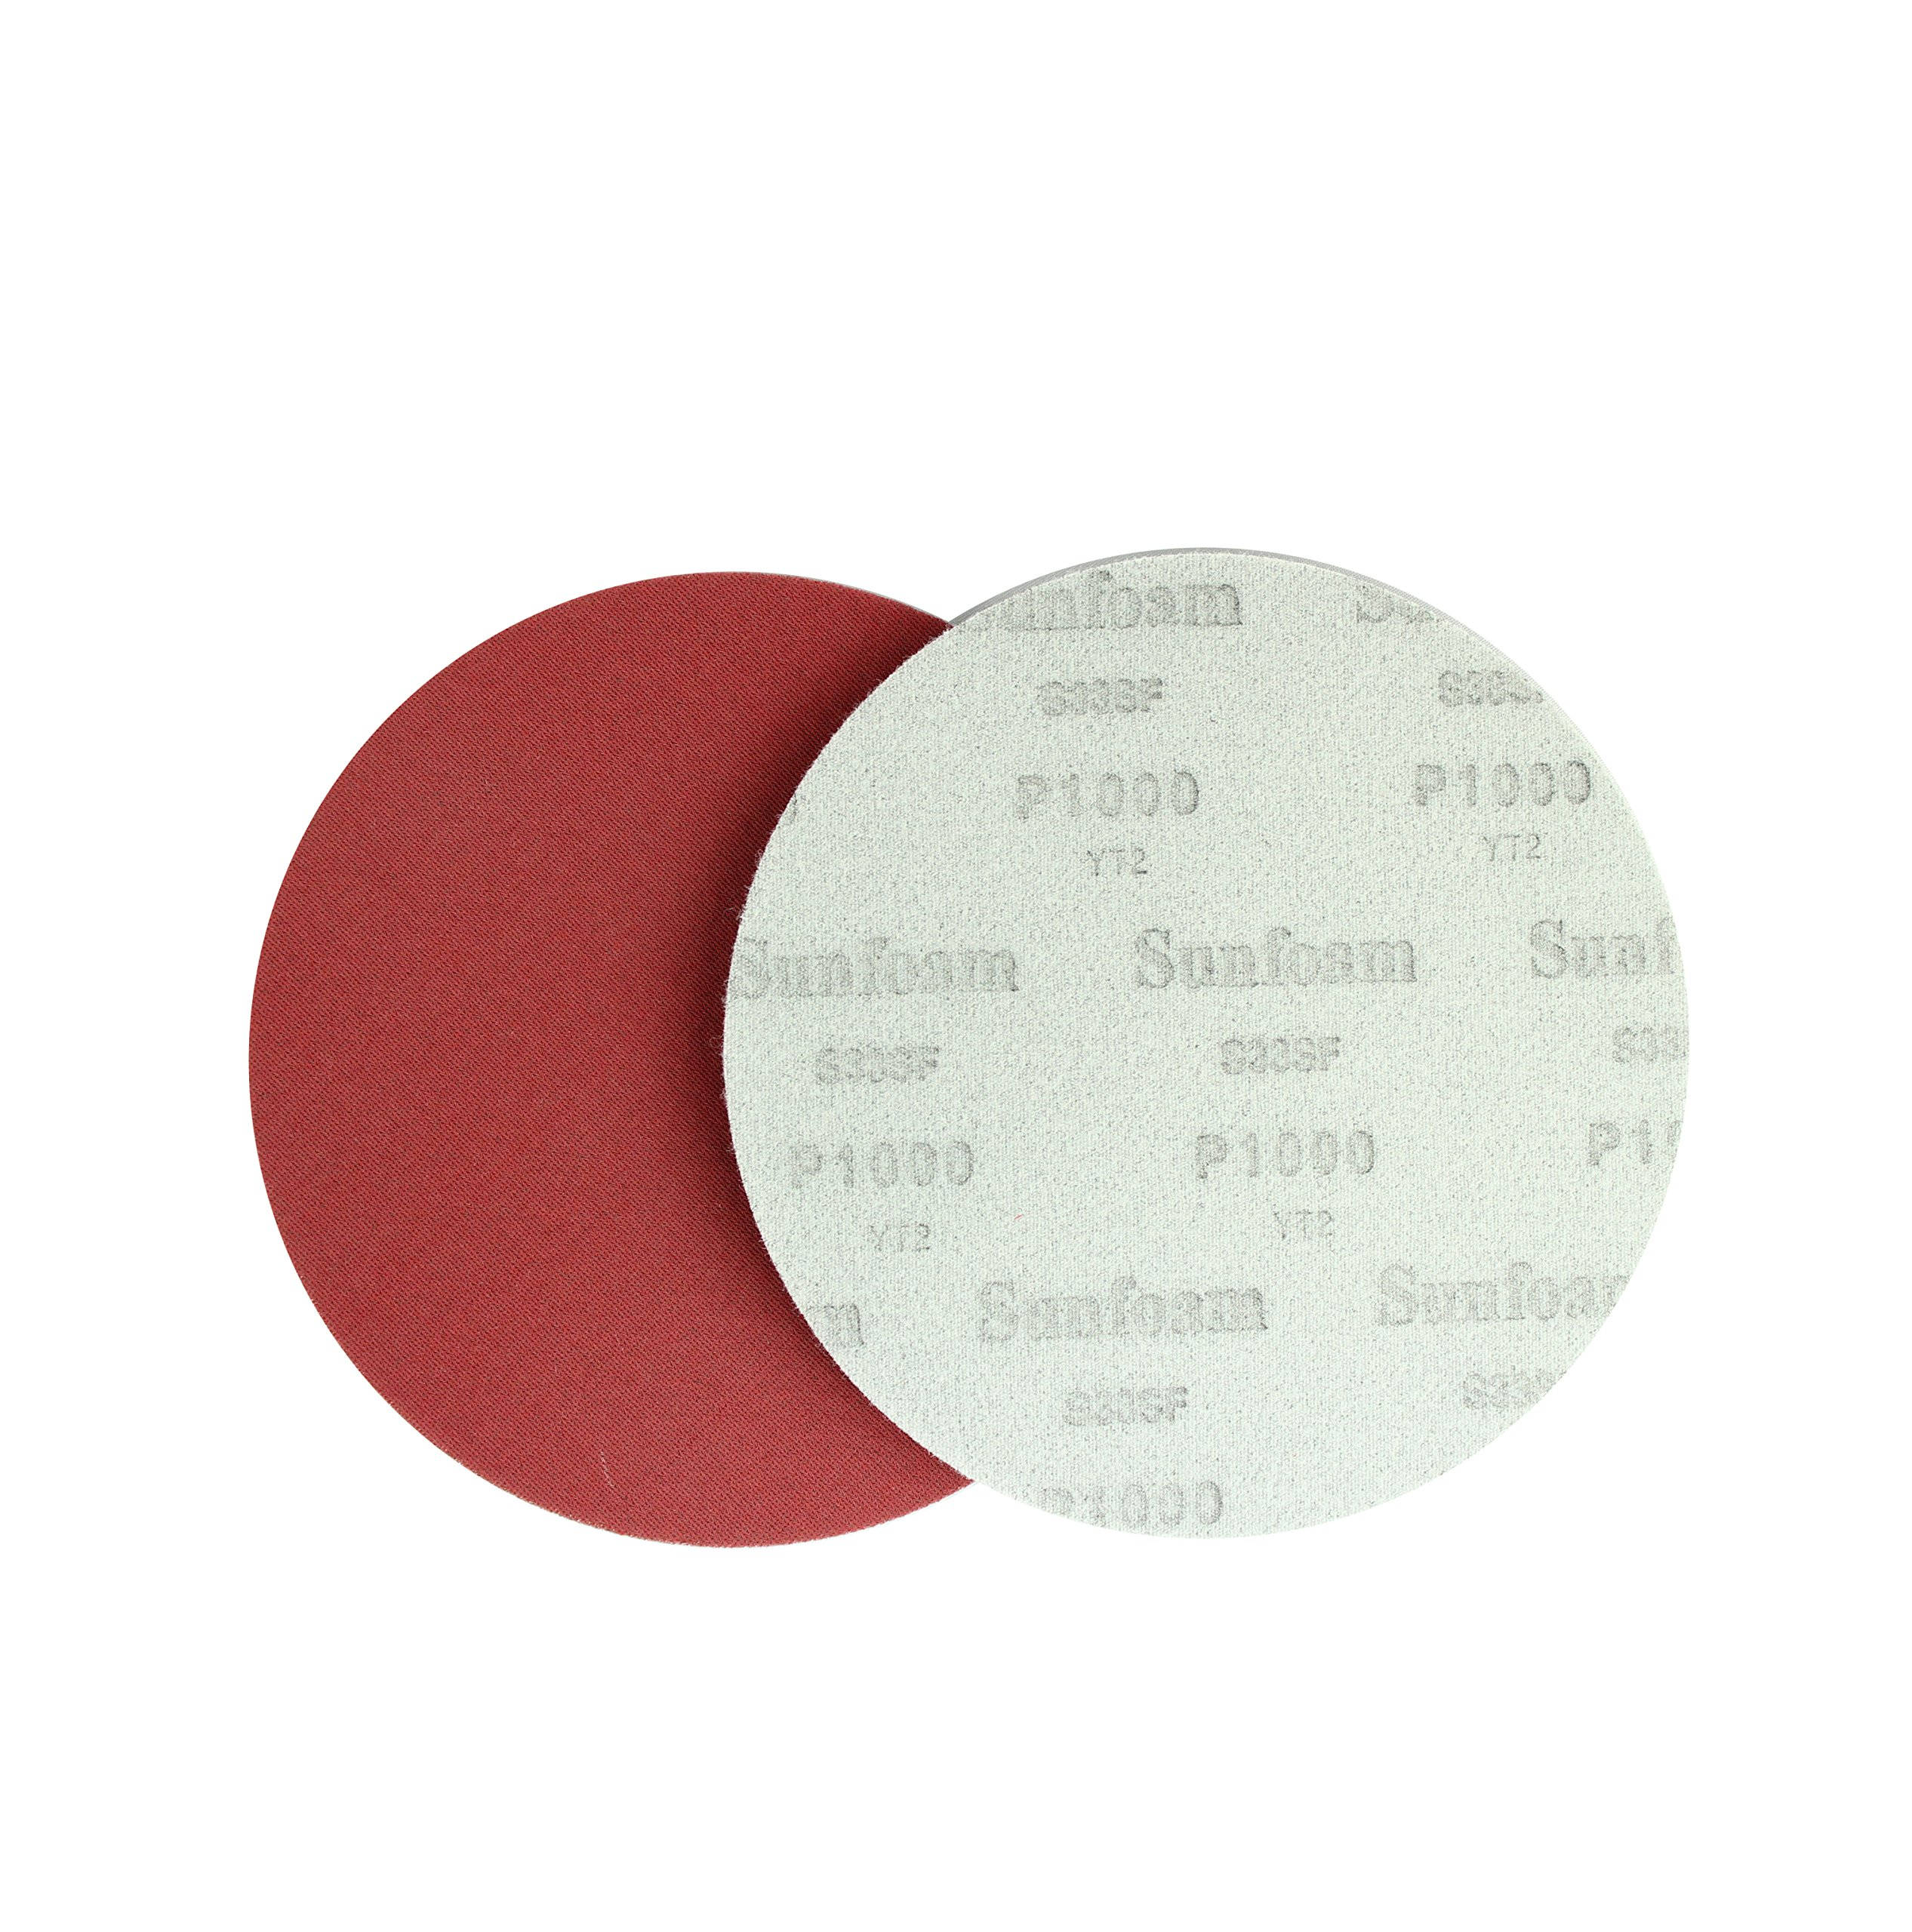 Sunmight 96220 1 Pack 6'' No Hole Velcro Foam Disc (Sunfoam Grit 1000) by Sunmight (Image #2)